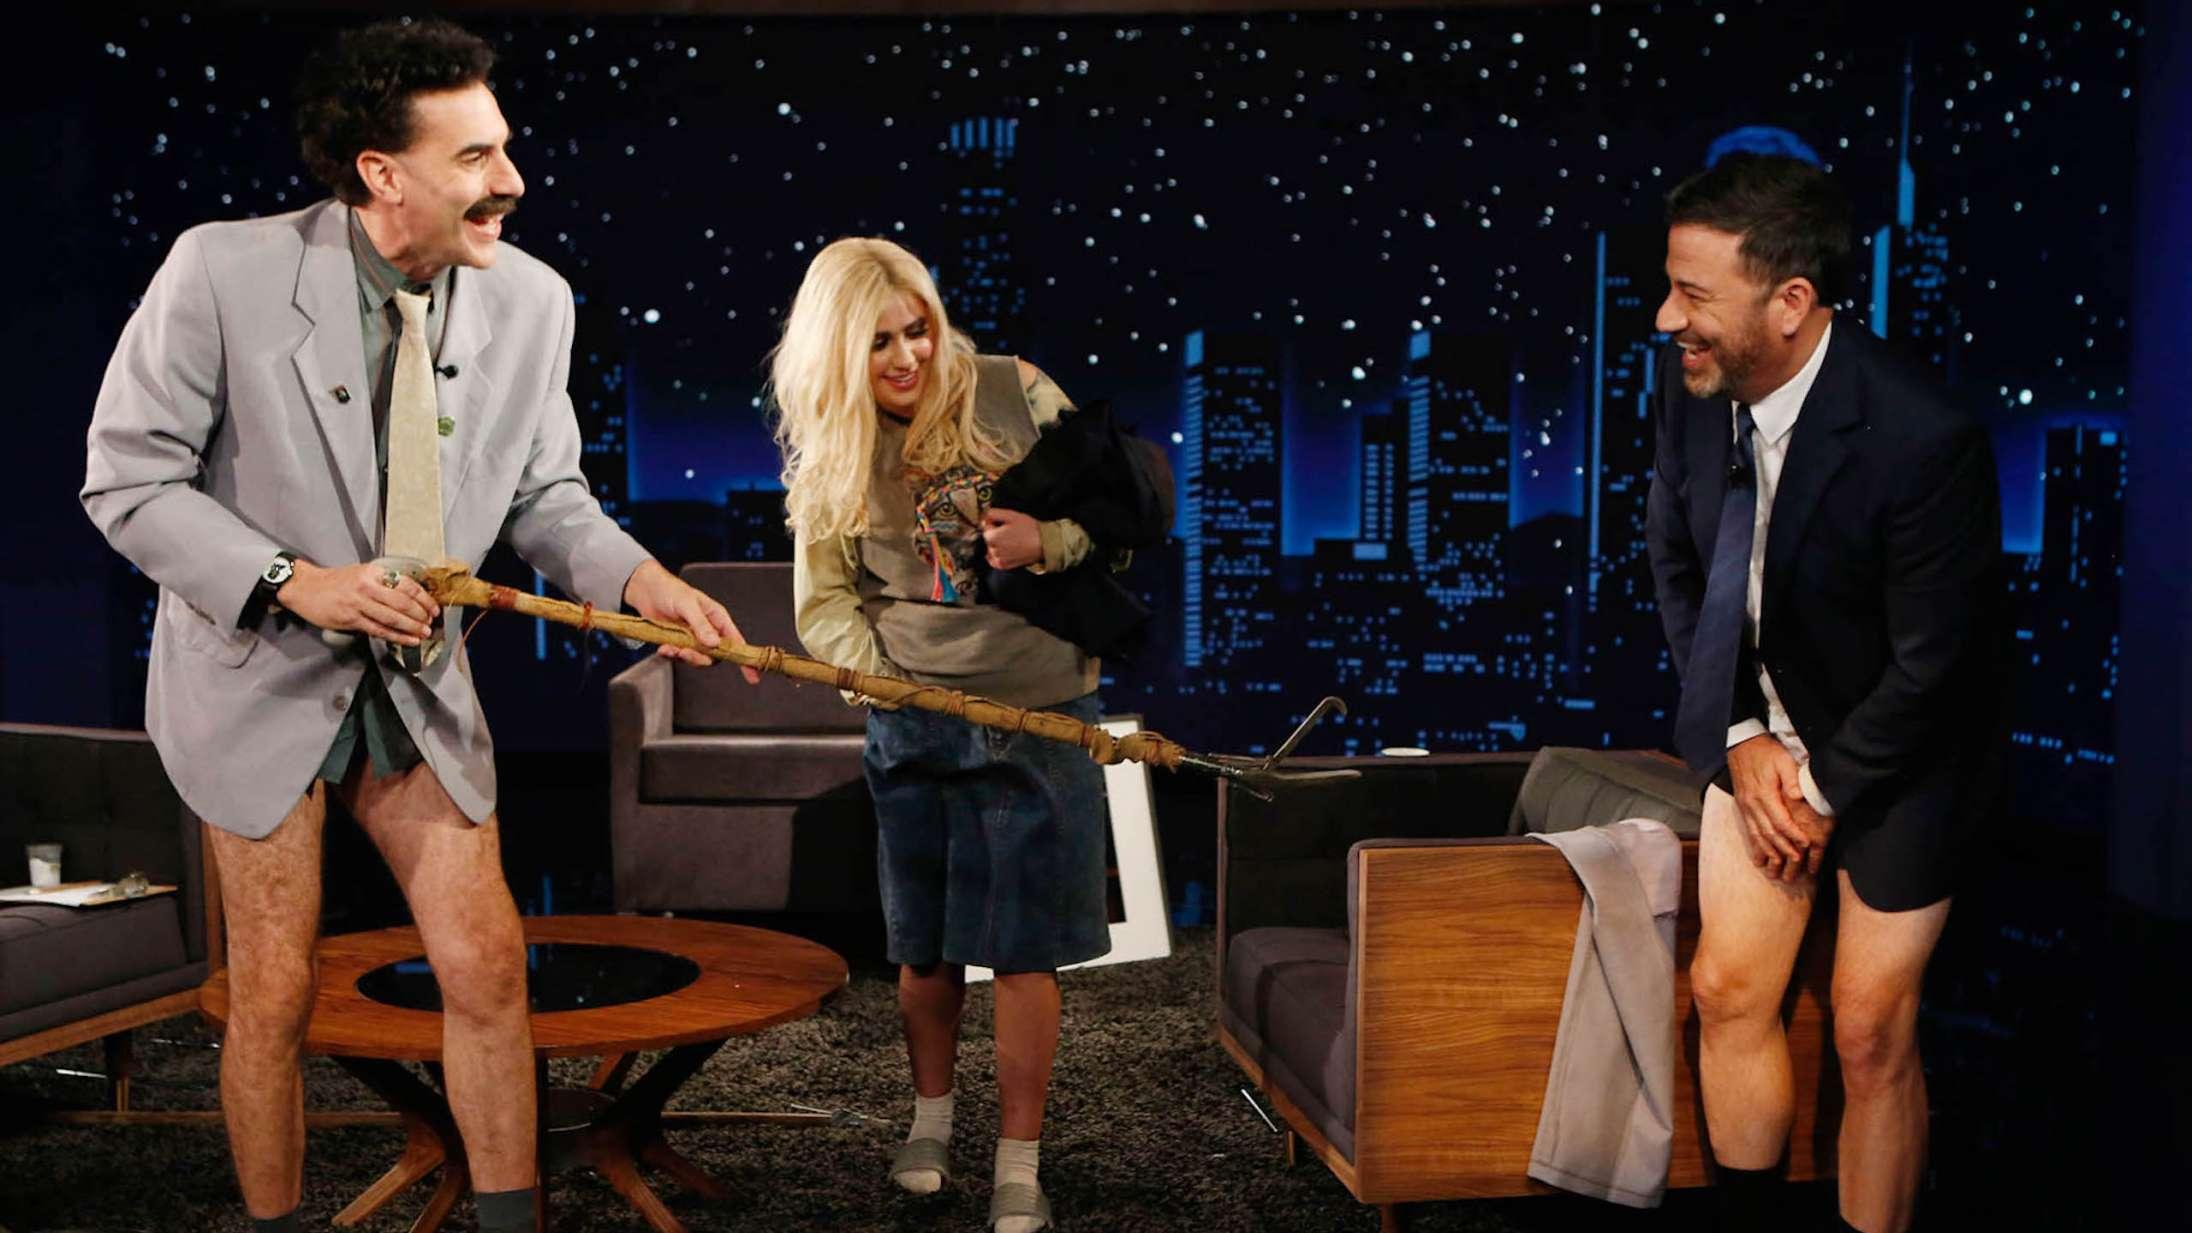 Borat giver Jimmy Kimmel et kaotisk corona-tjek i 'Jimmy Kimmel Live'